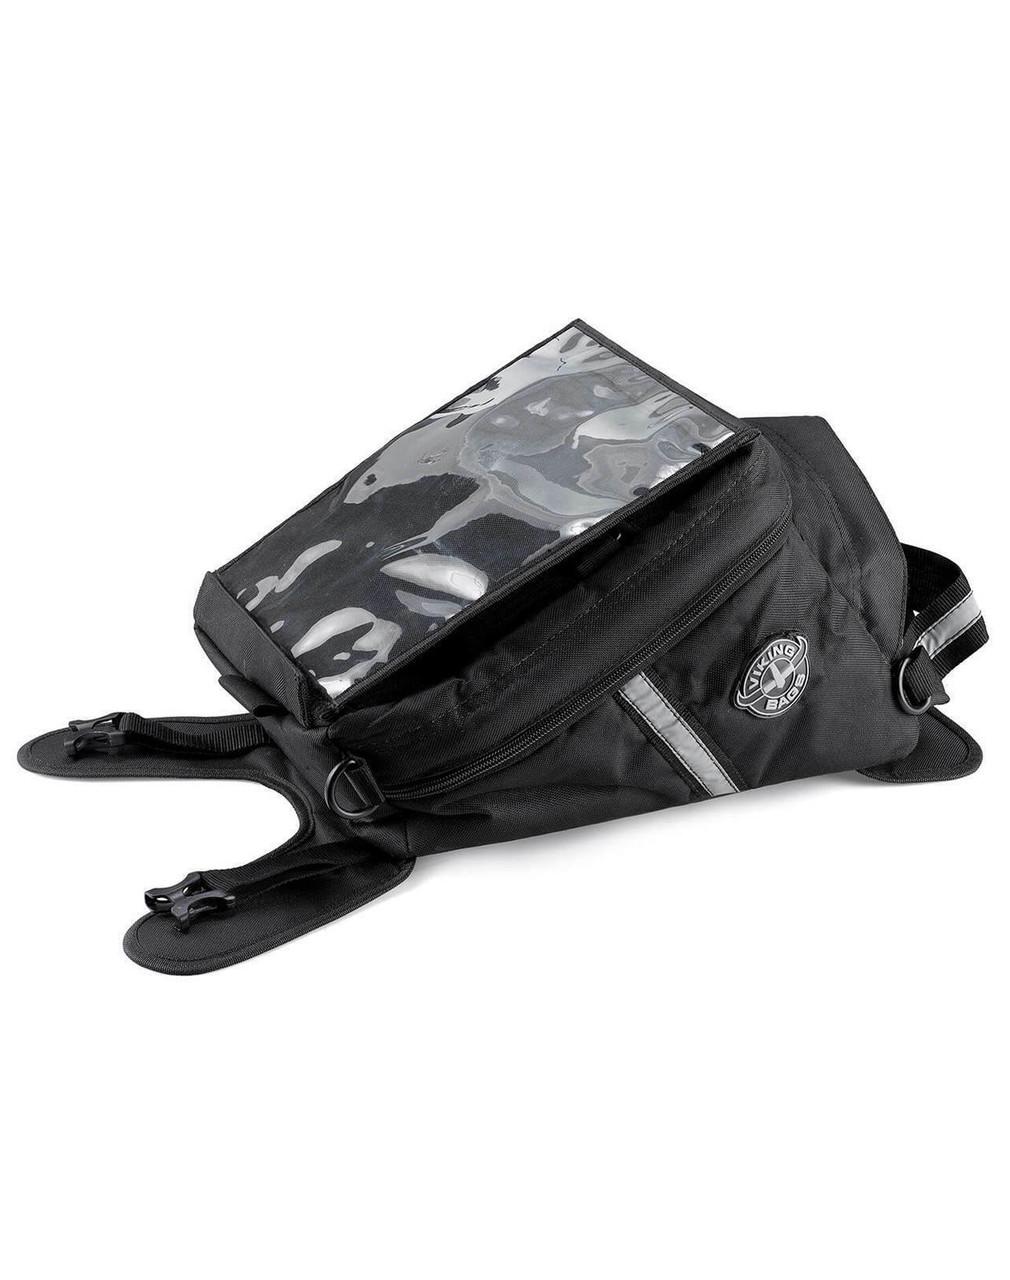 Viking Dirtman Small Black Suzuki Motorcycle Tank Bag Main Bag View